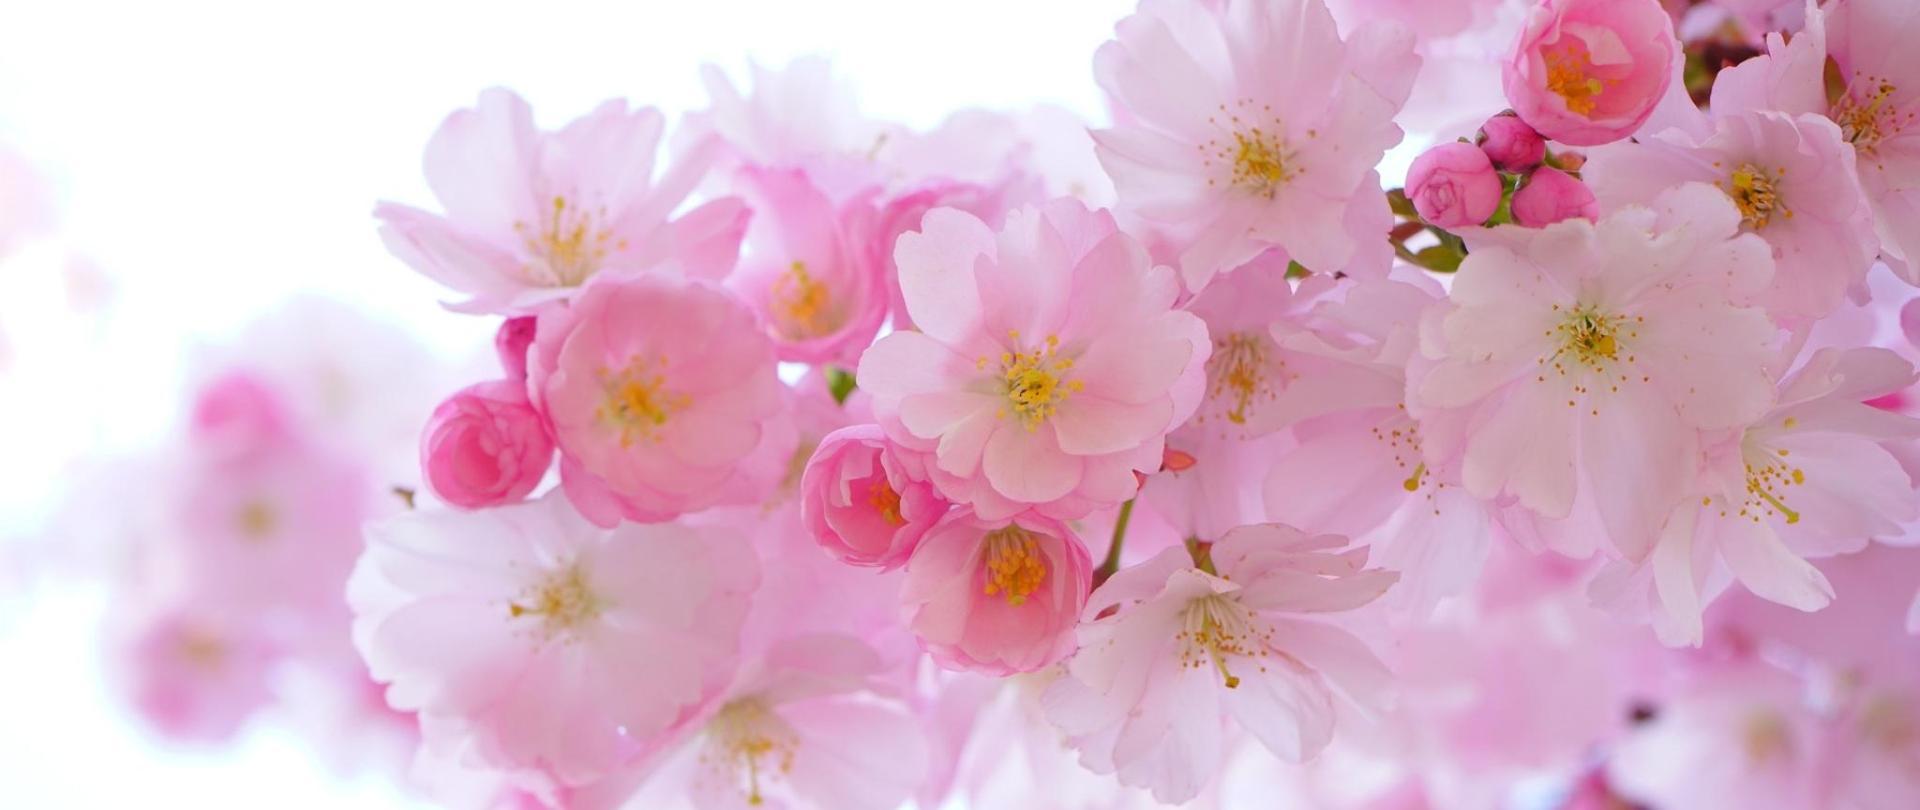 japanese-cherry-trees-flowers-spring-japanese-flowering-cherry-54630.jpeg